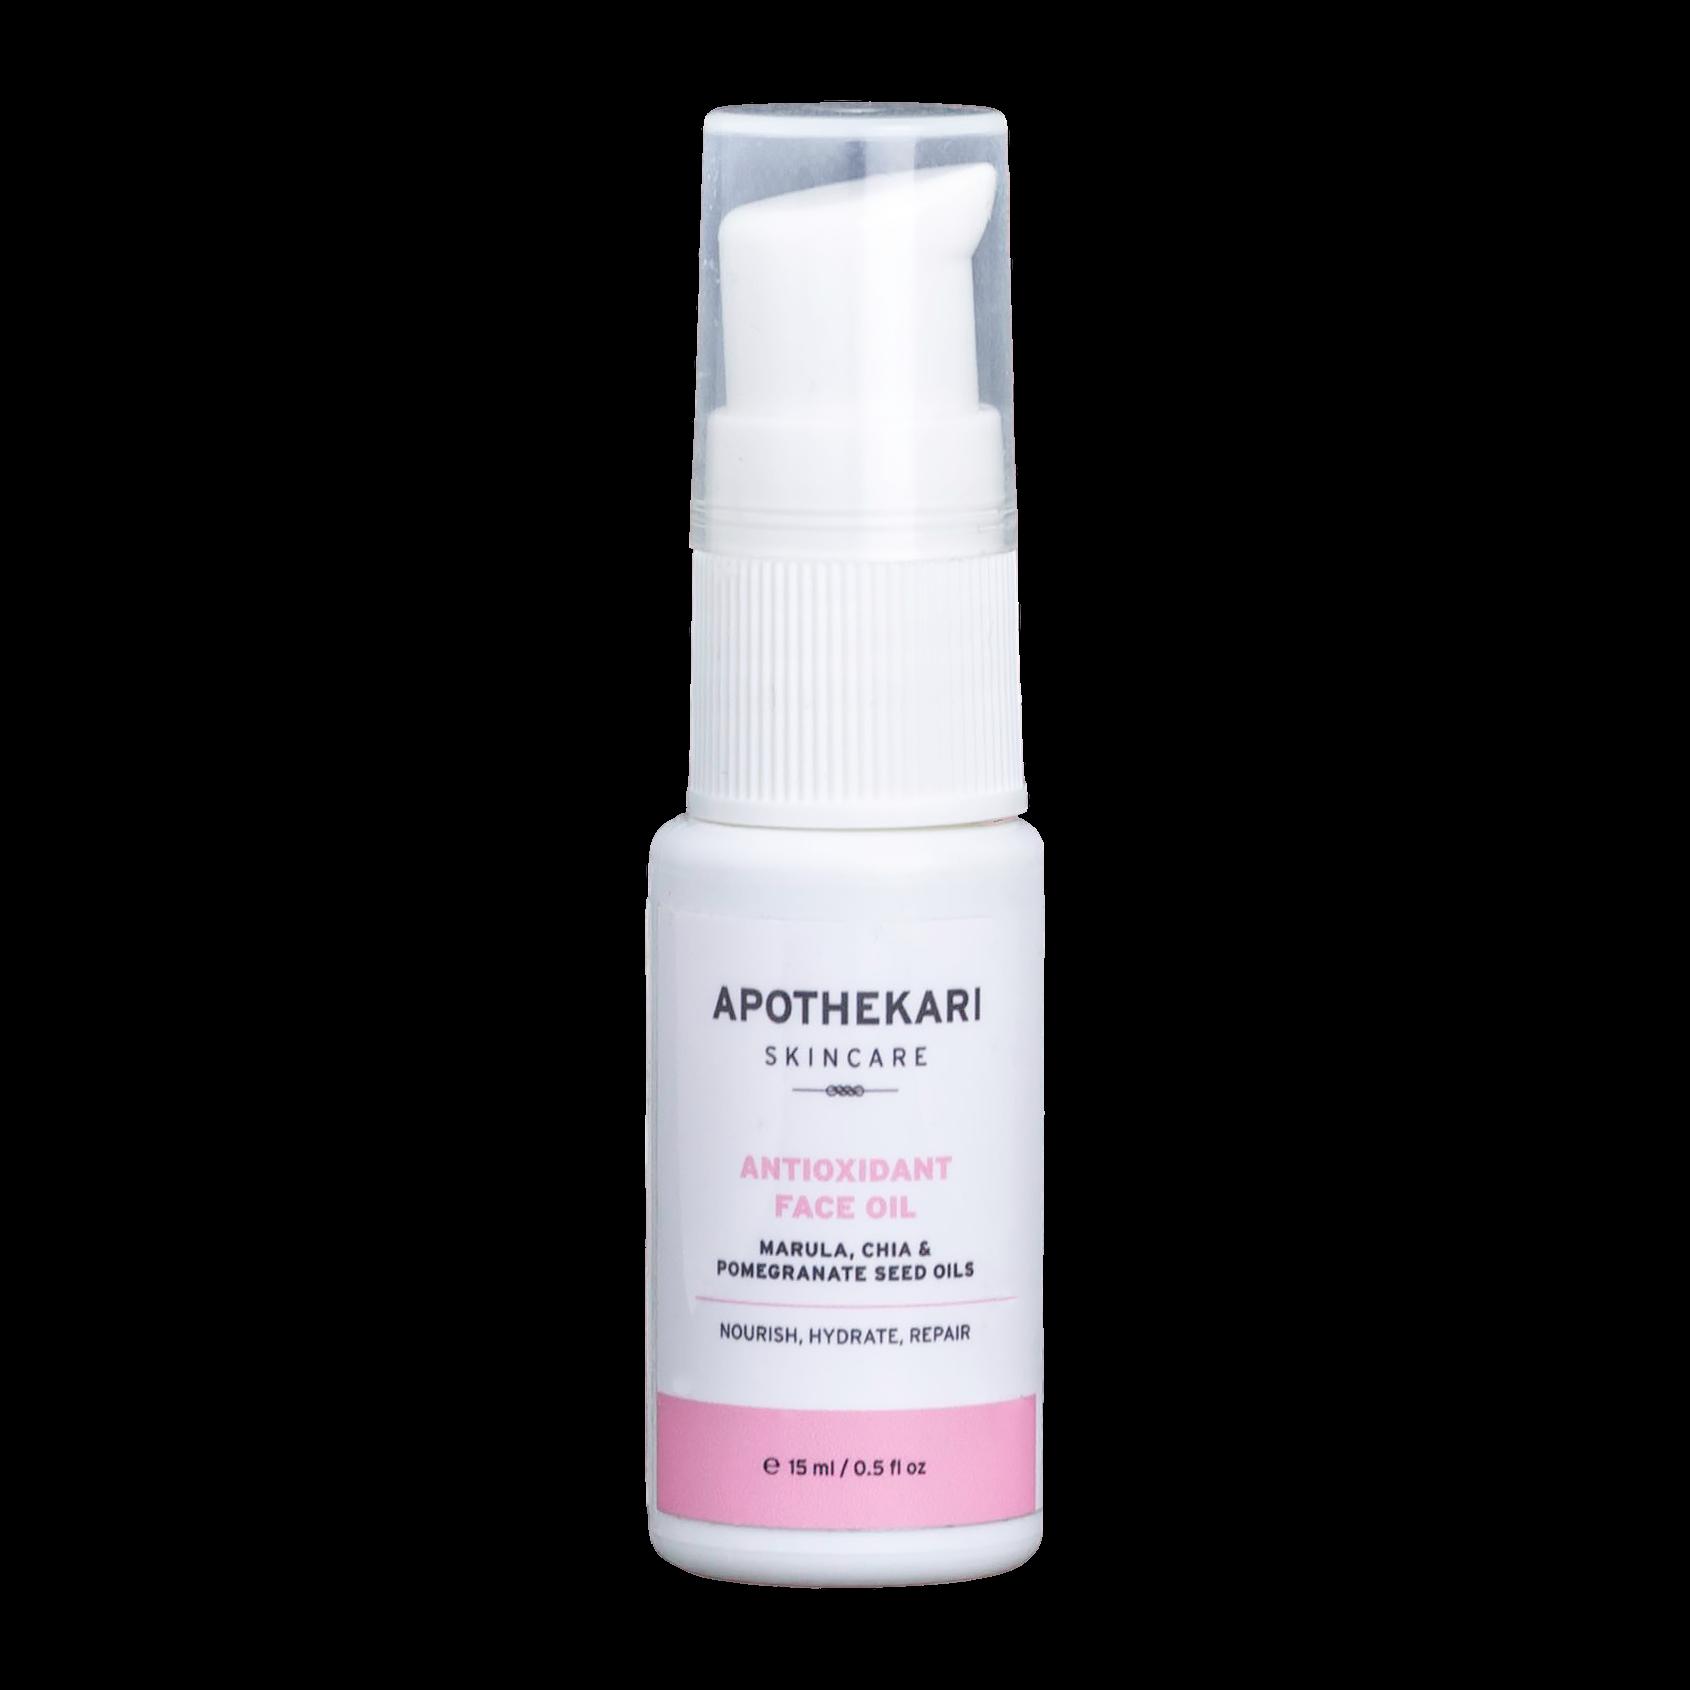 Antioxidant-Face-Oil-Apothekari-Skincare